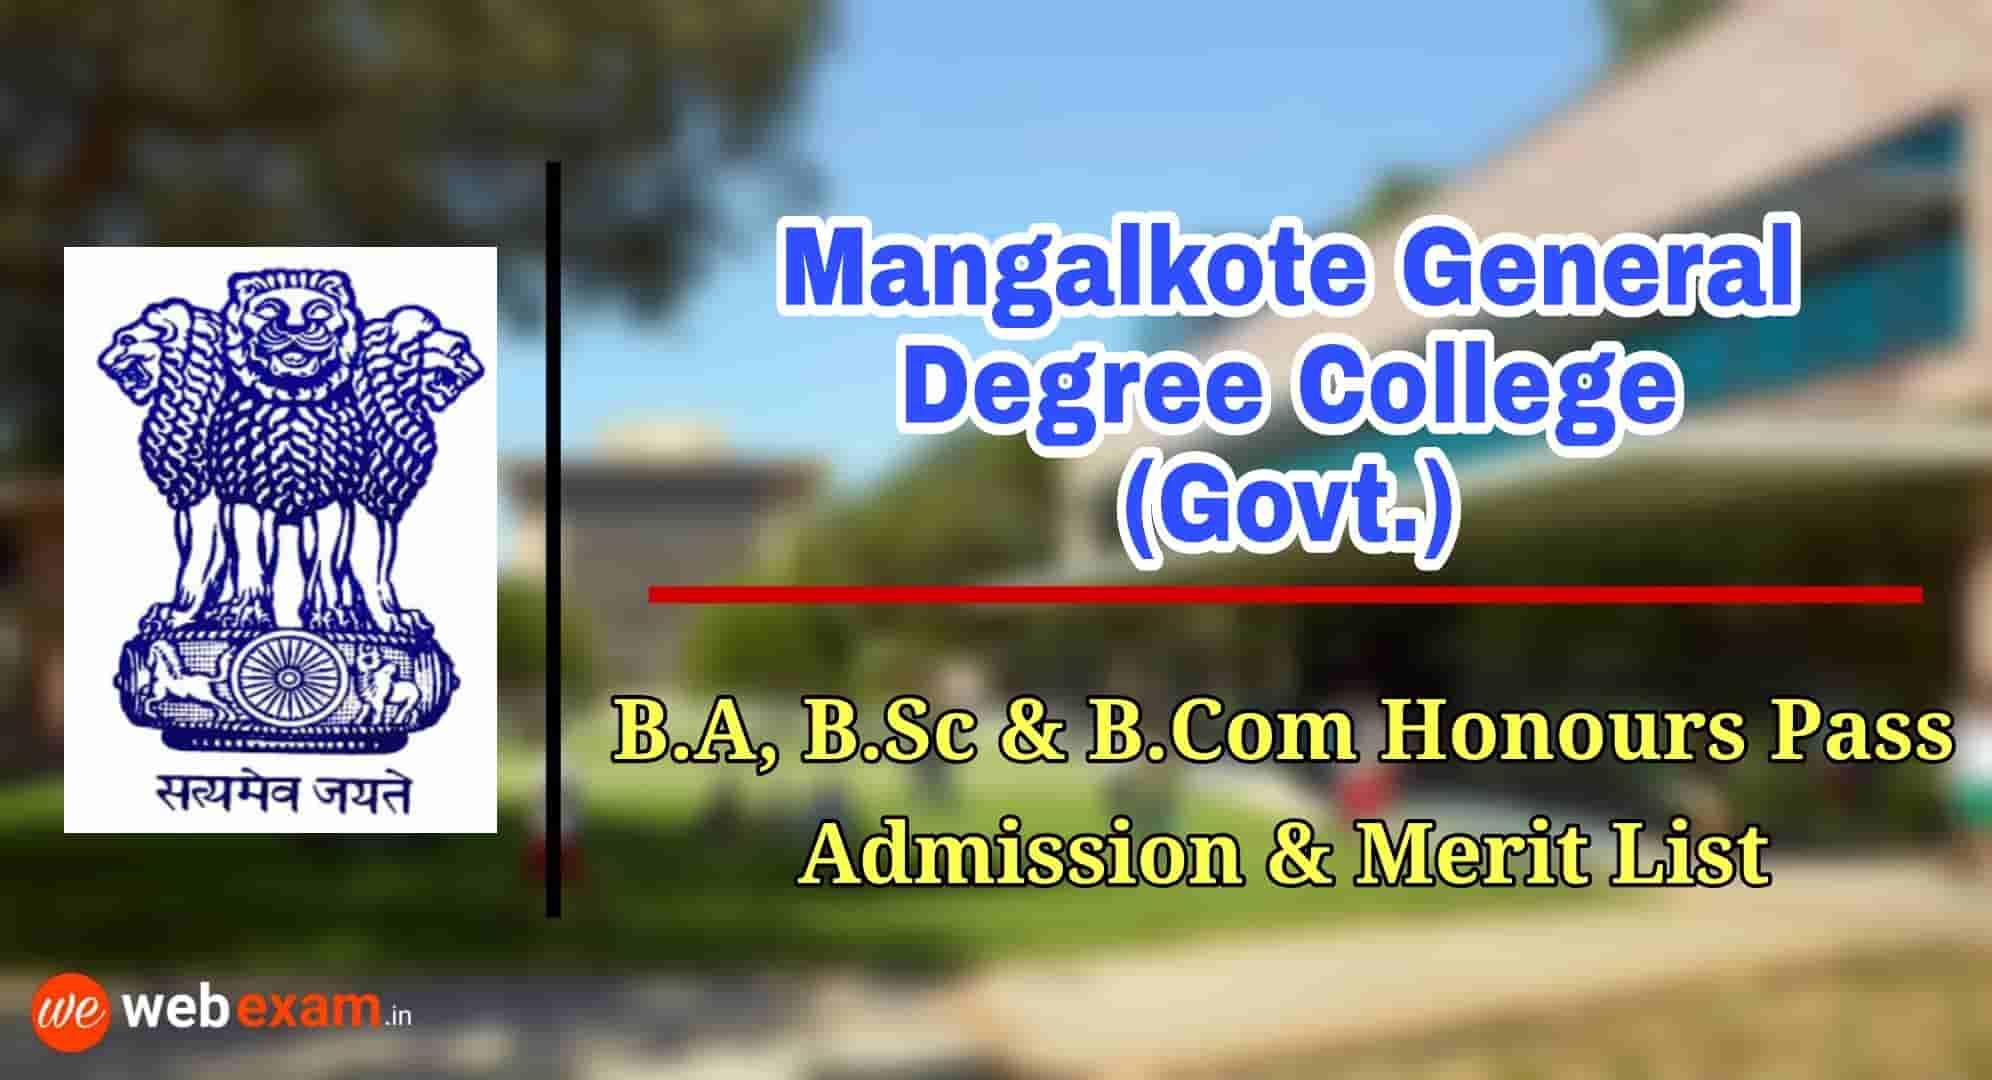 Mangalkote General Degree College (Govt.)